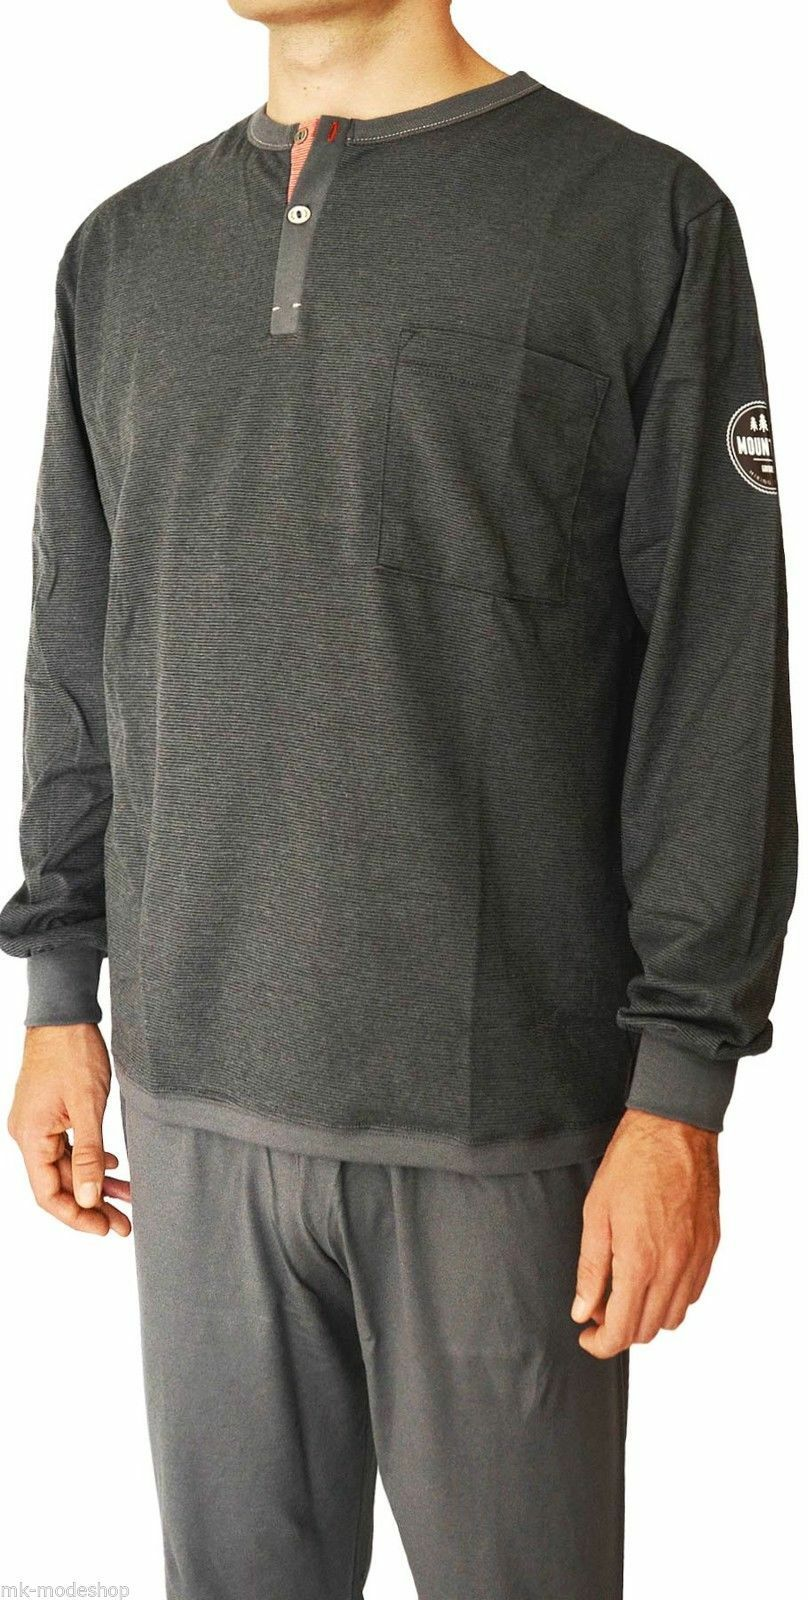 Ammann - Herren Schlafanzug lang (Pyjama), Steel grau (grau)